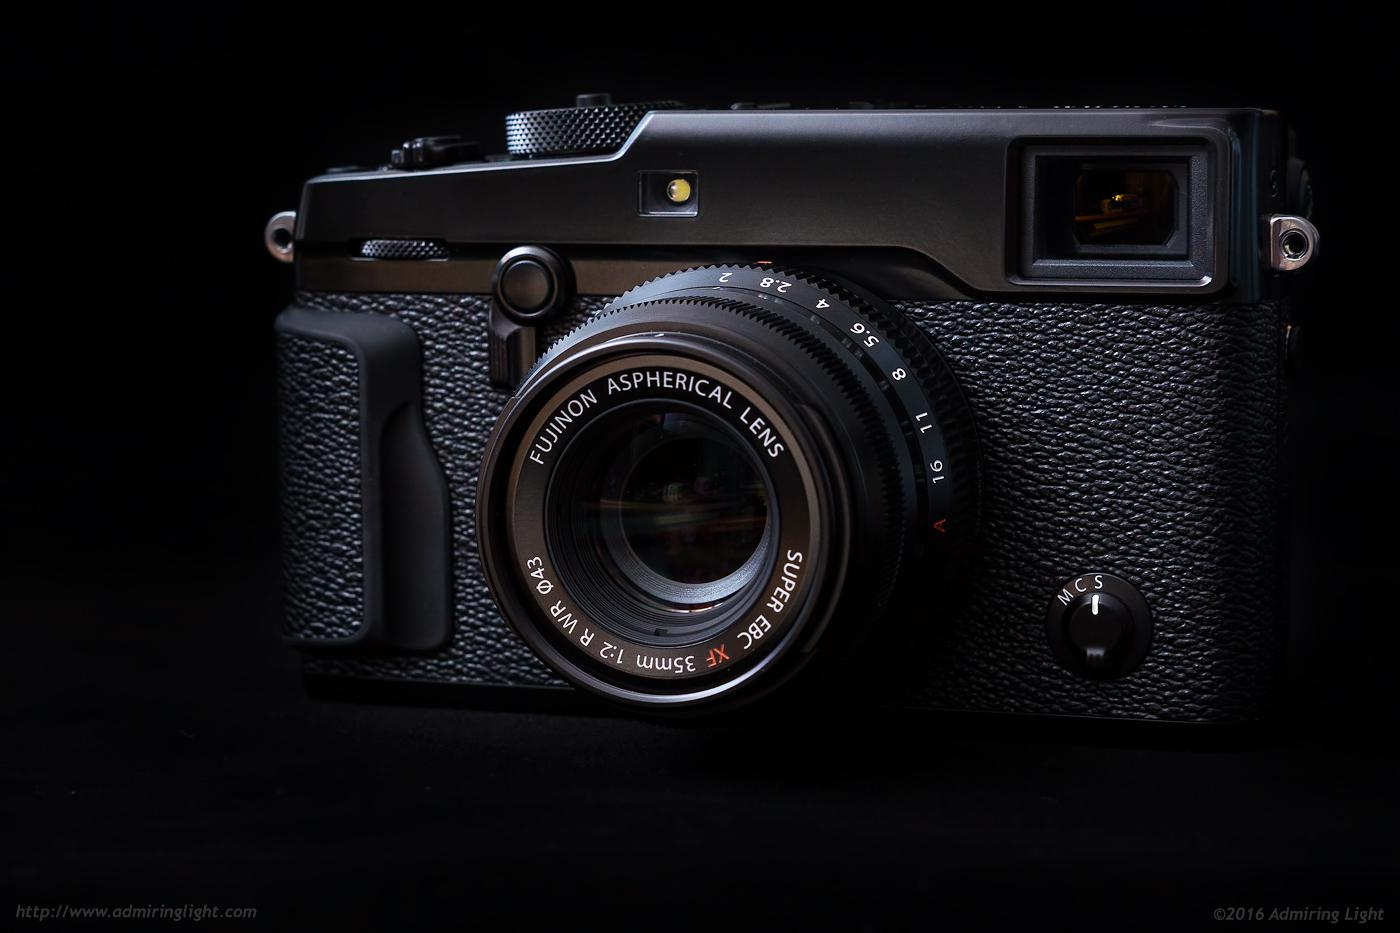 The Fujifilm X-Pro 2